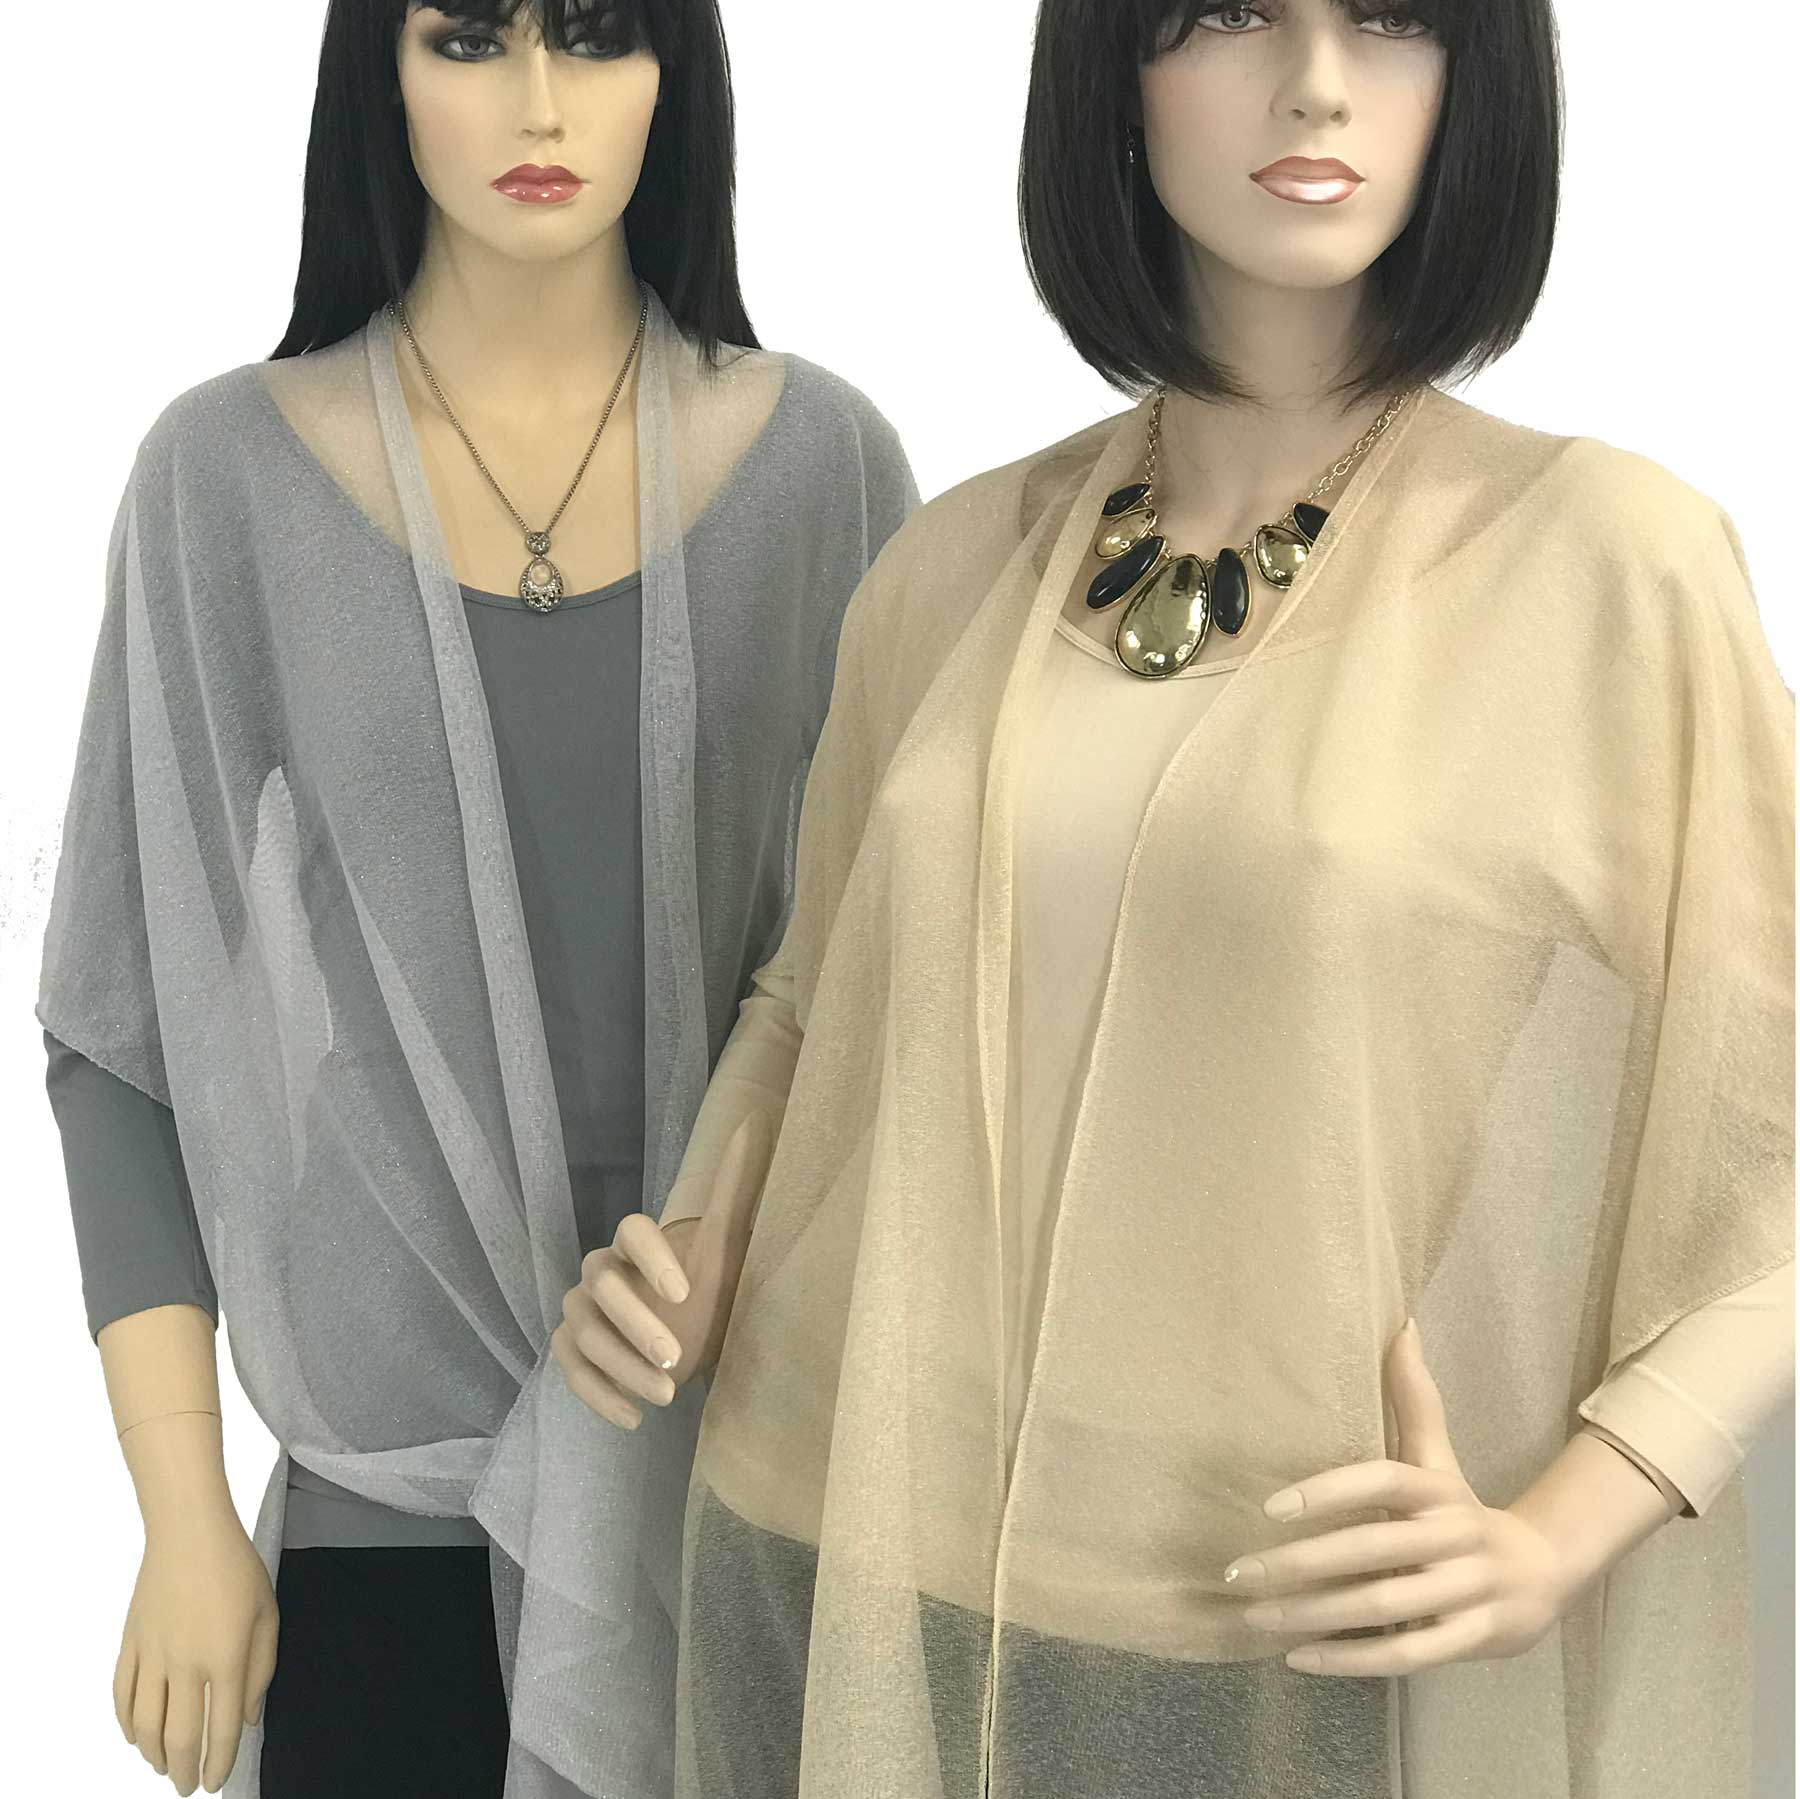 Kimono Vests - Lurex Sheer 9647